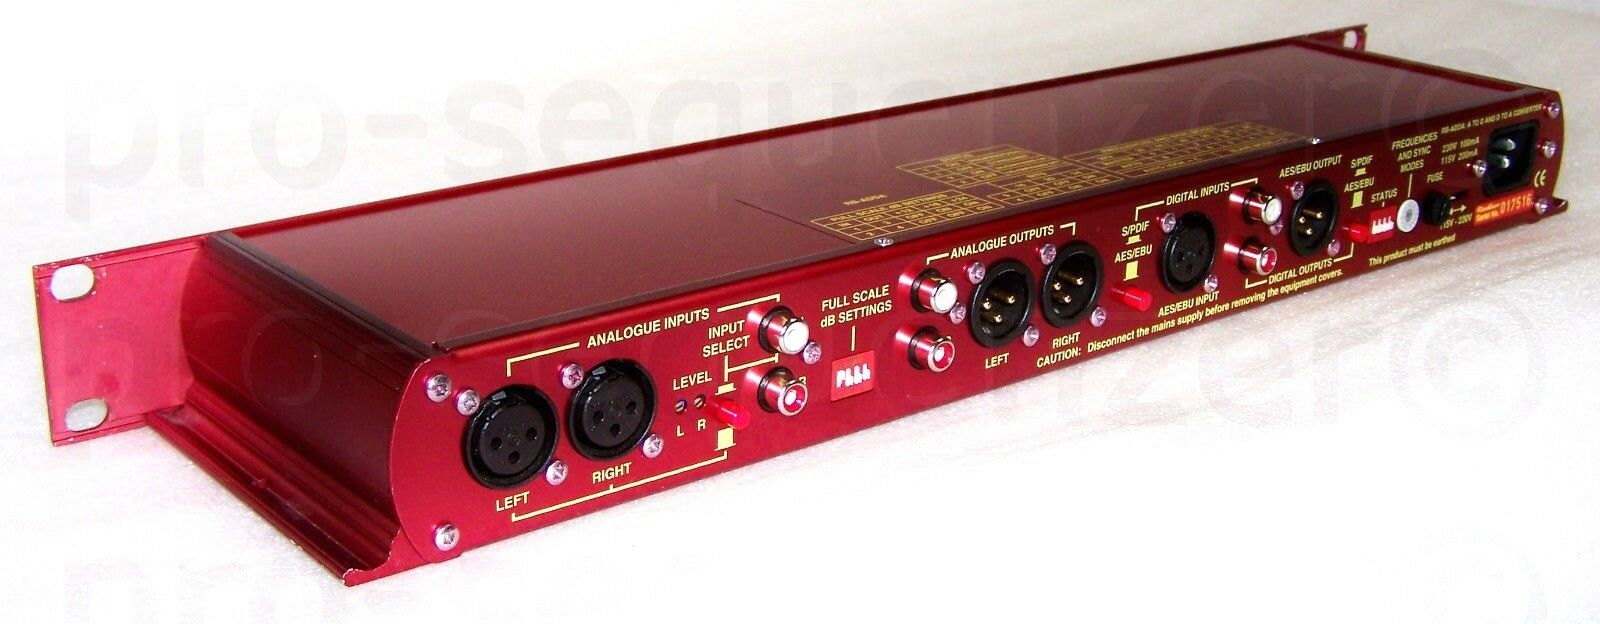 Sonifex rotbox RB-ADDA High-End Wandler ConGrüner AES EBU S PDIF + Garantie